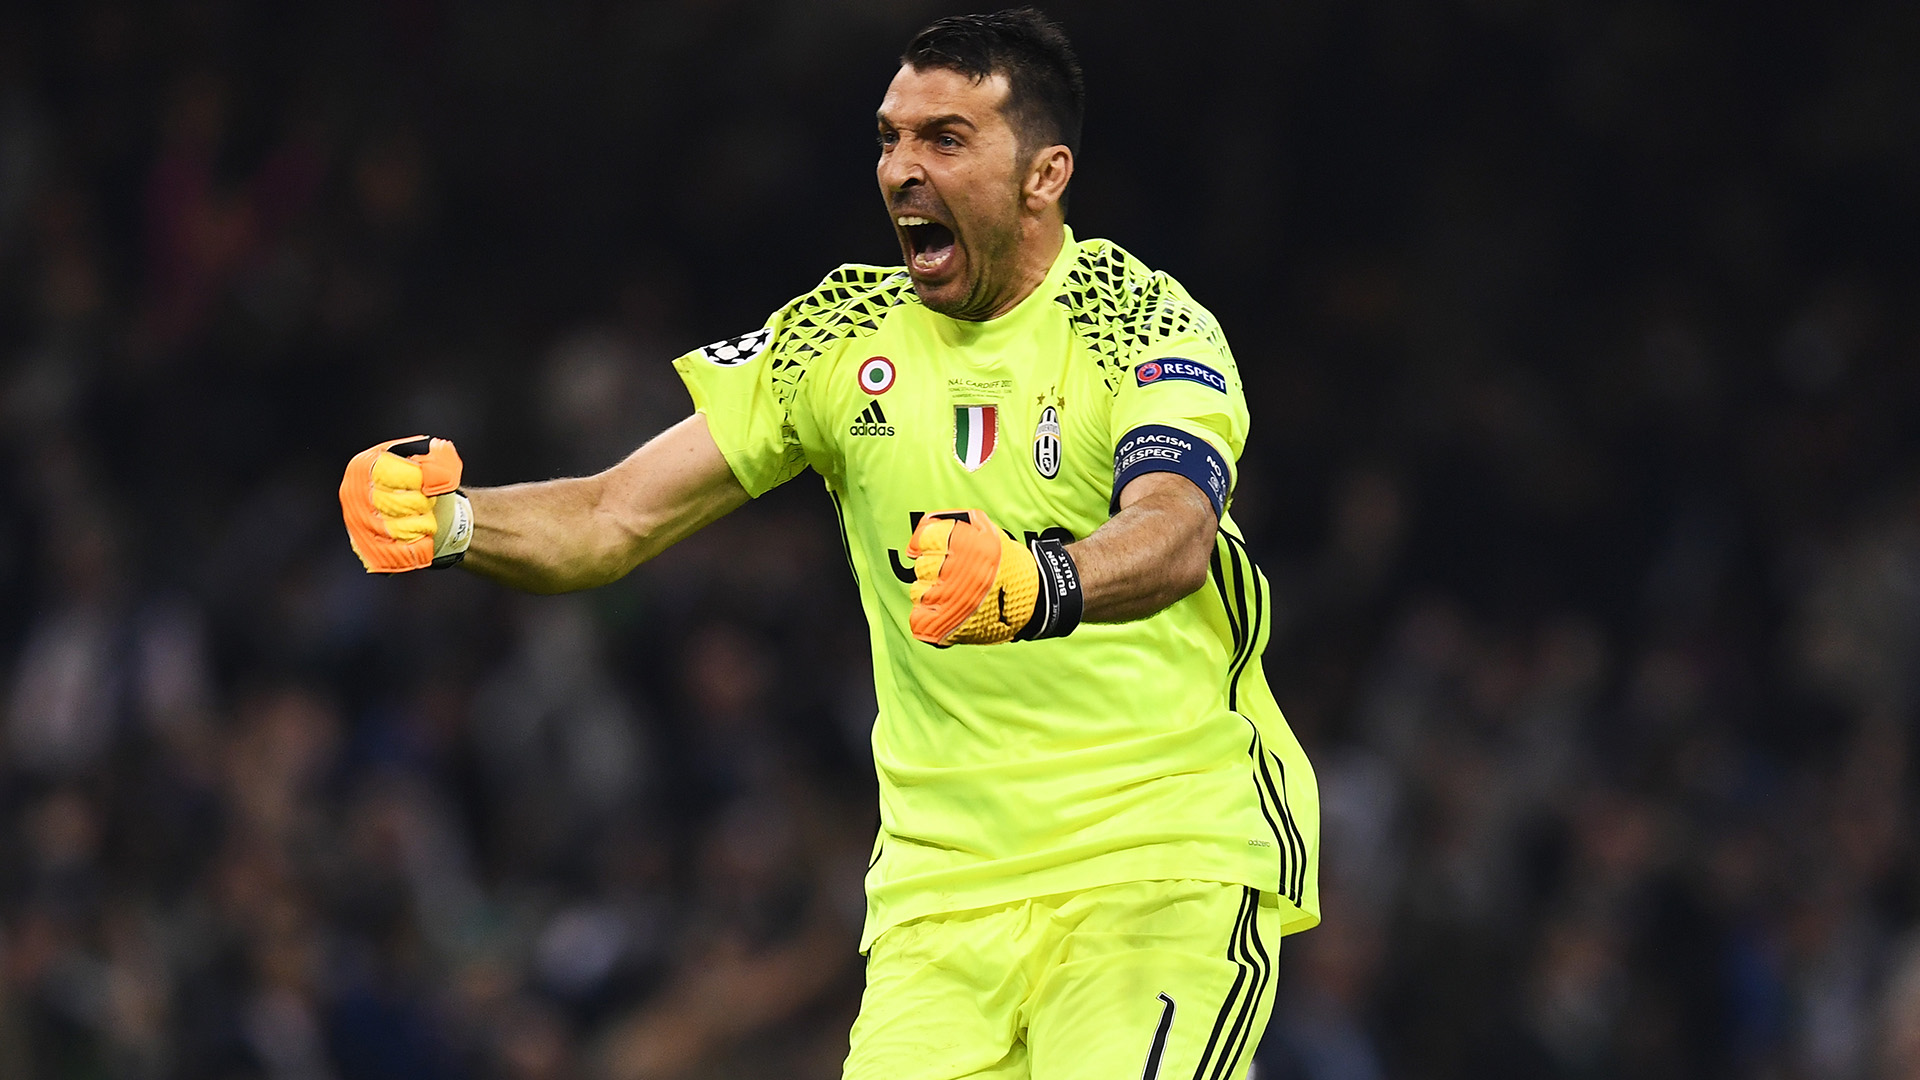 Buffon consiglia la Juventus: